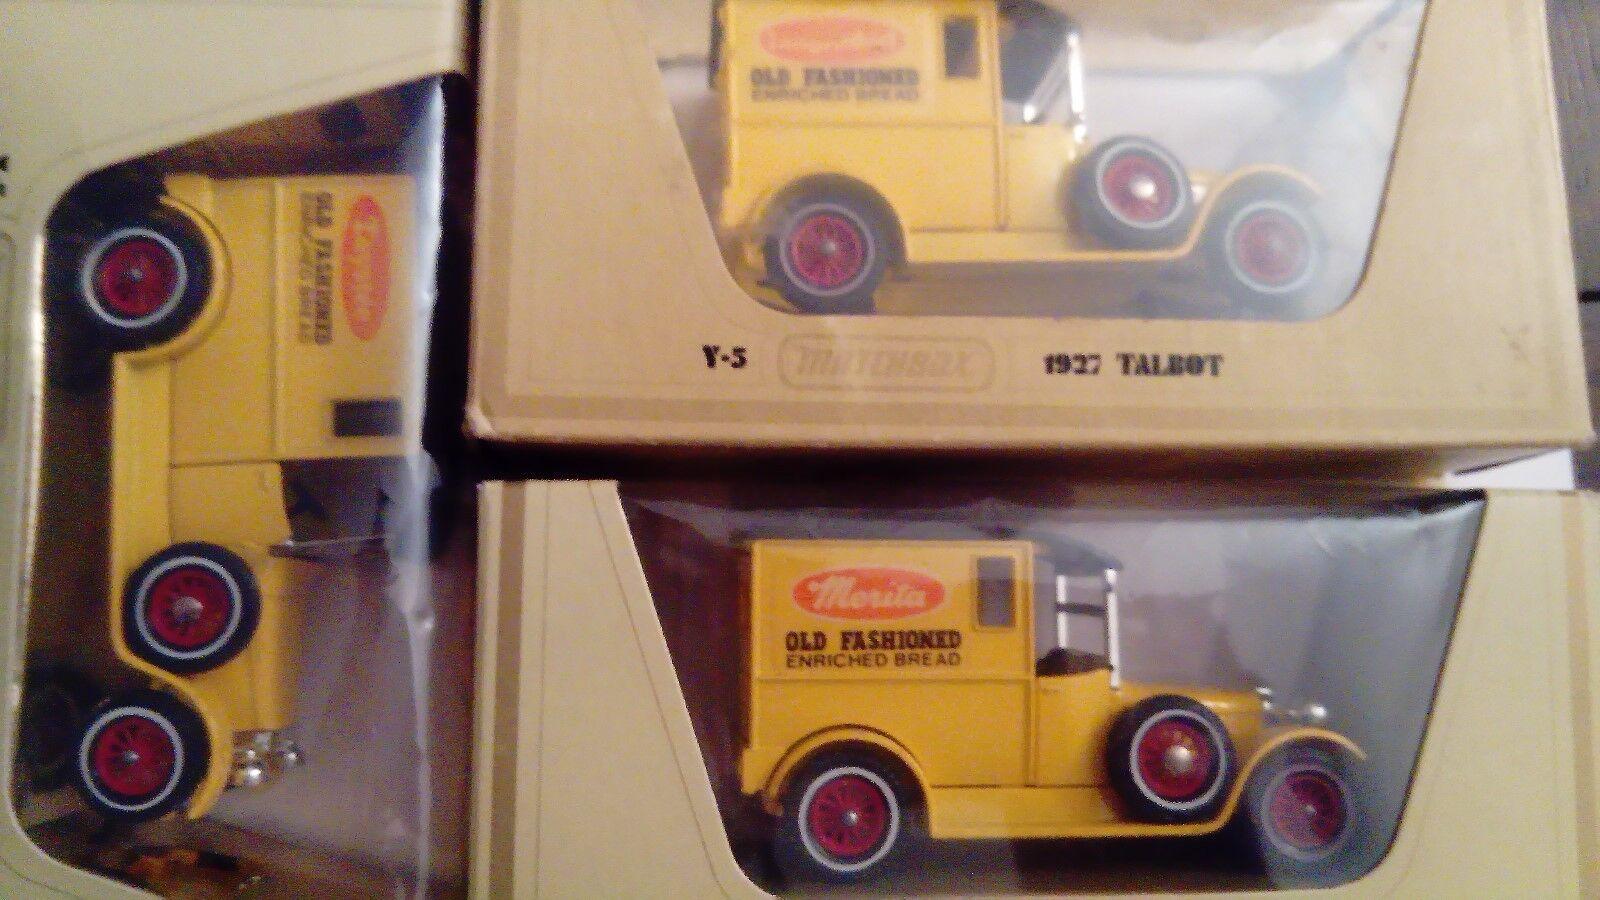 Very RARE, yy-05 Talbot Bread Set-Merita B. - Langendorf B. MOY, code 2, w. box